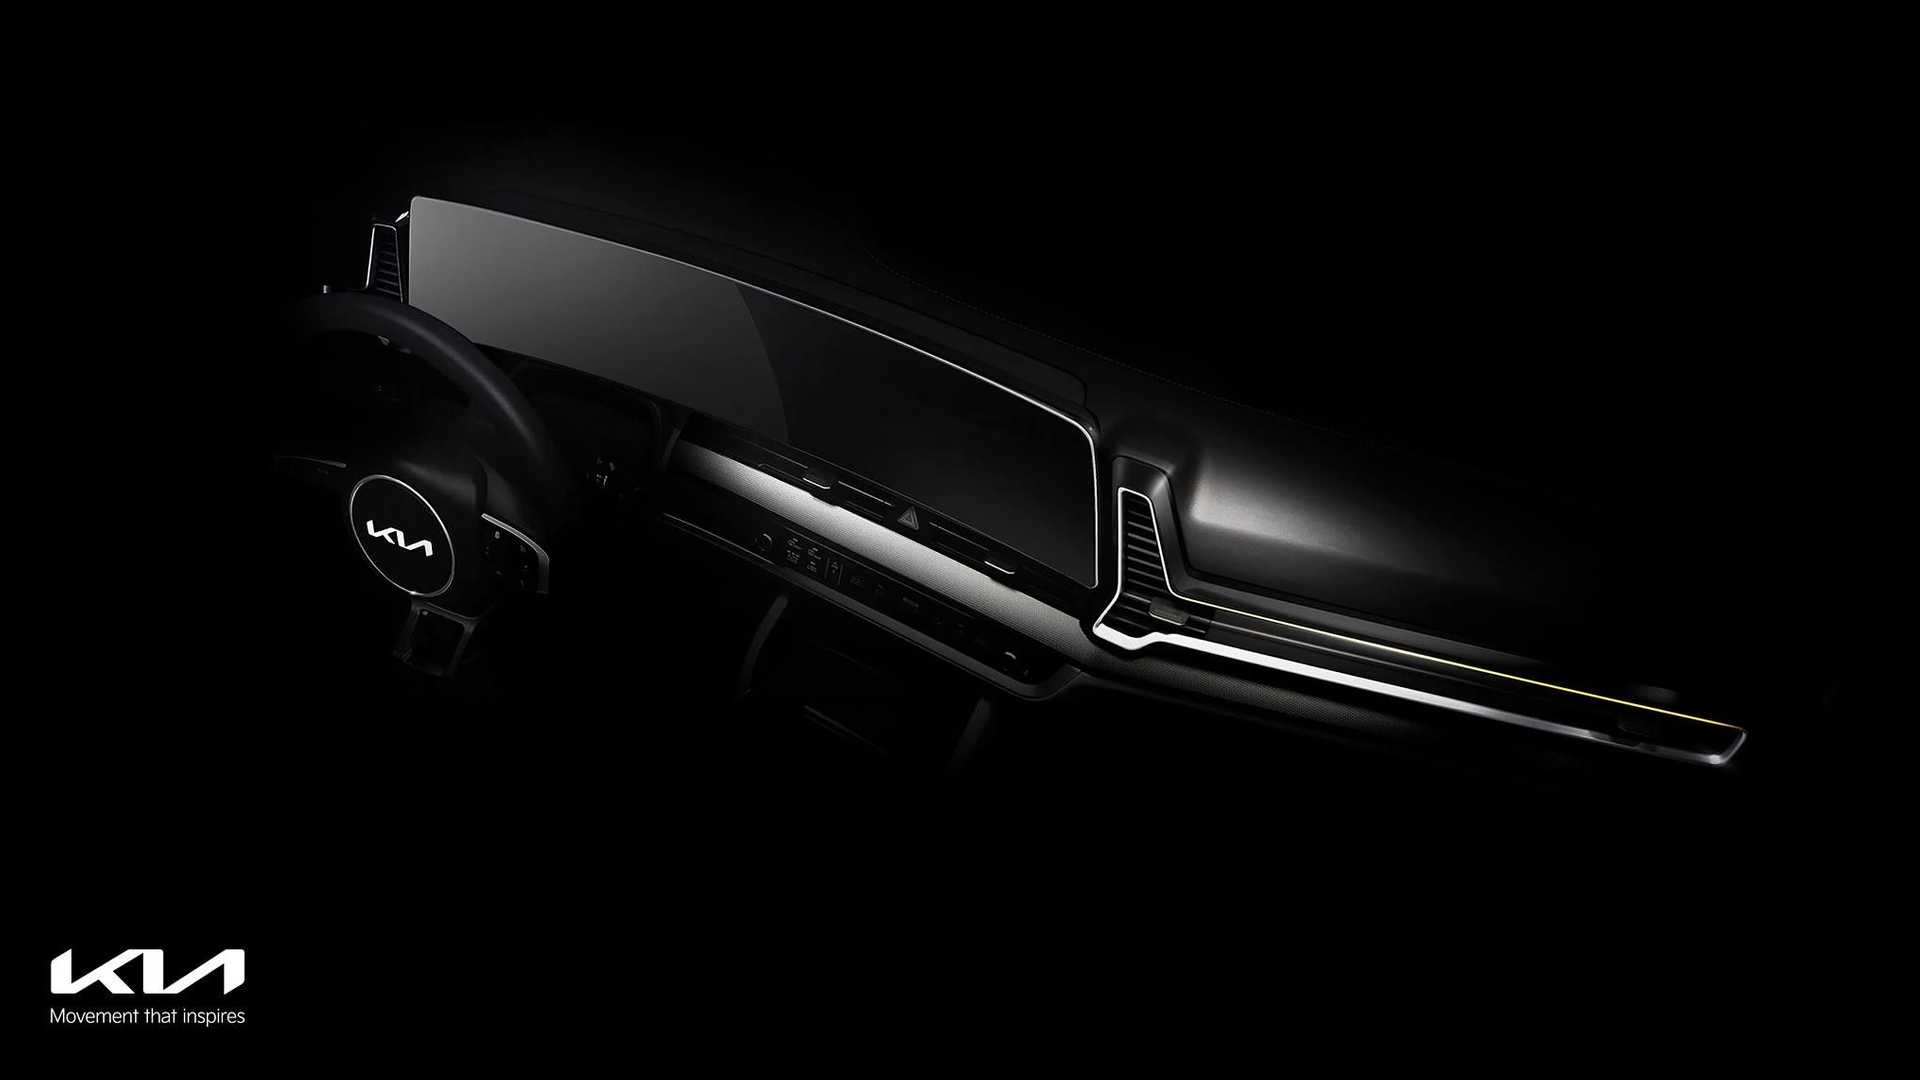 5th gen 2022 new kia sportage interior teaser